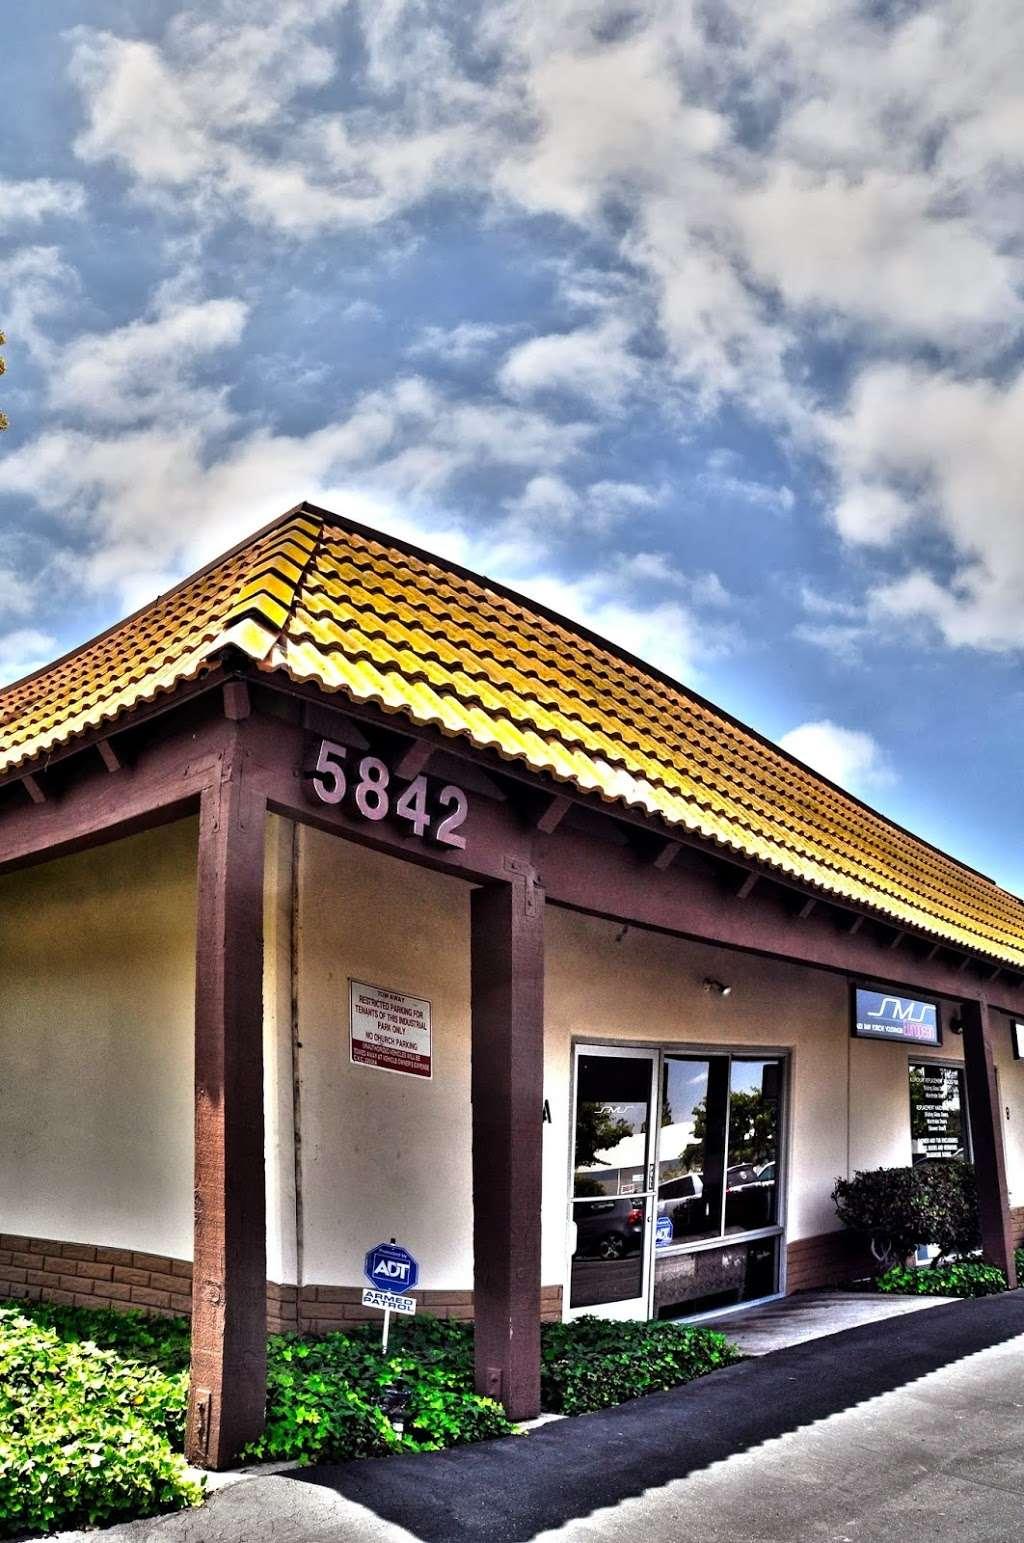 SMS European - car repair  | Photo 4 of 10 | Address: 5842 McFadden Ave, Suite A, Huntington Beach, CA 92649, USA | Phone: (714) 889-6553